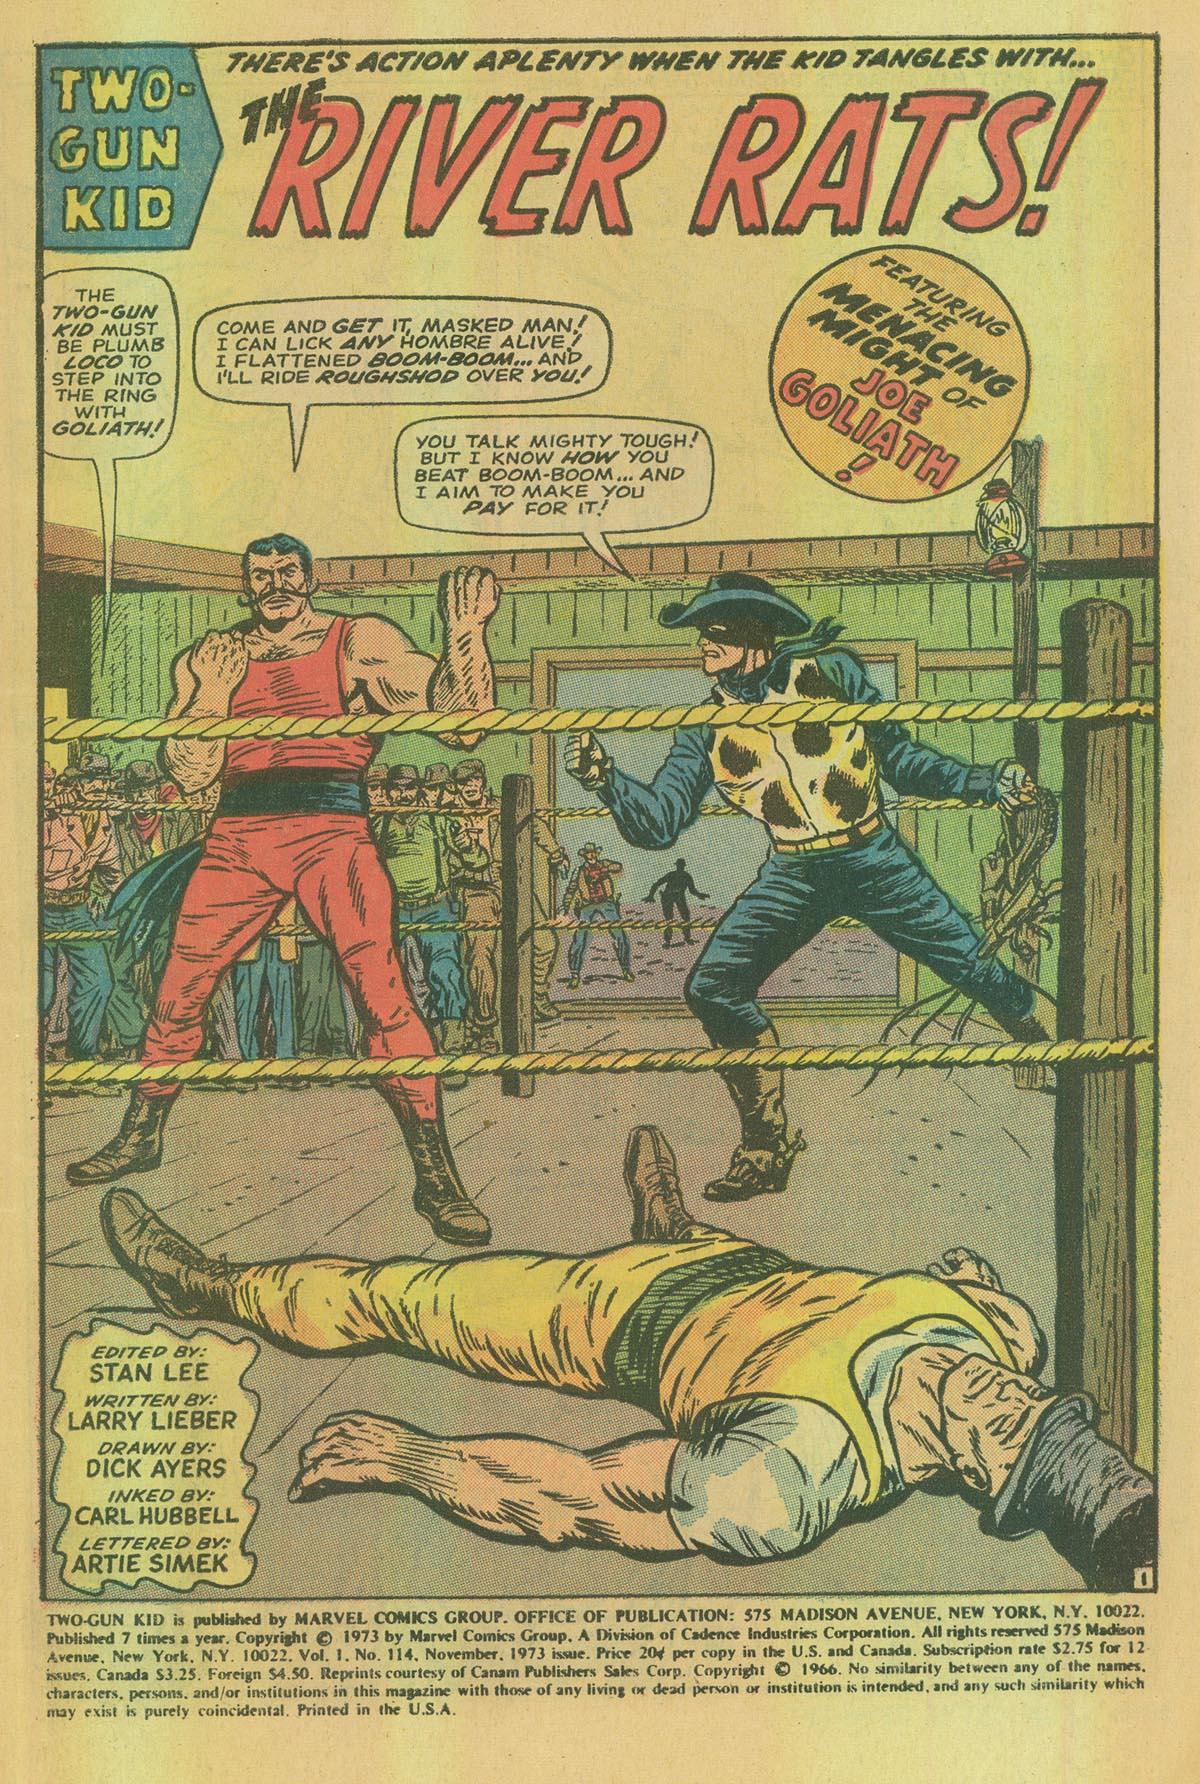 Read online Two-Gun Kid comic -  Issue #114 - 3